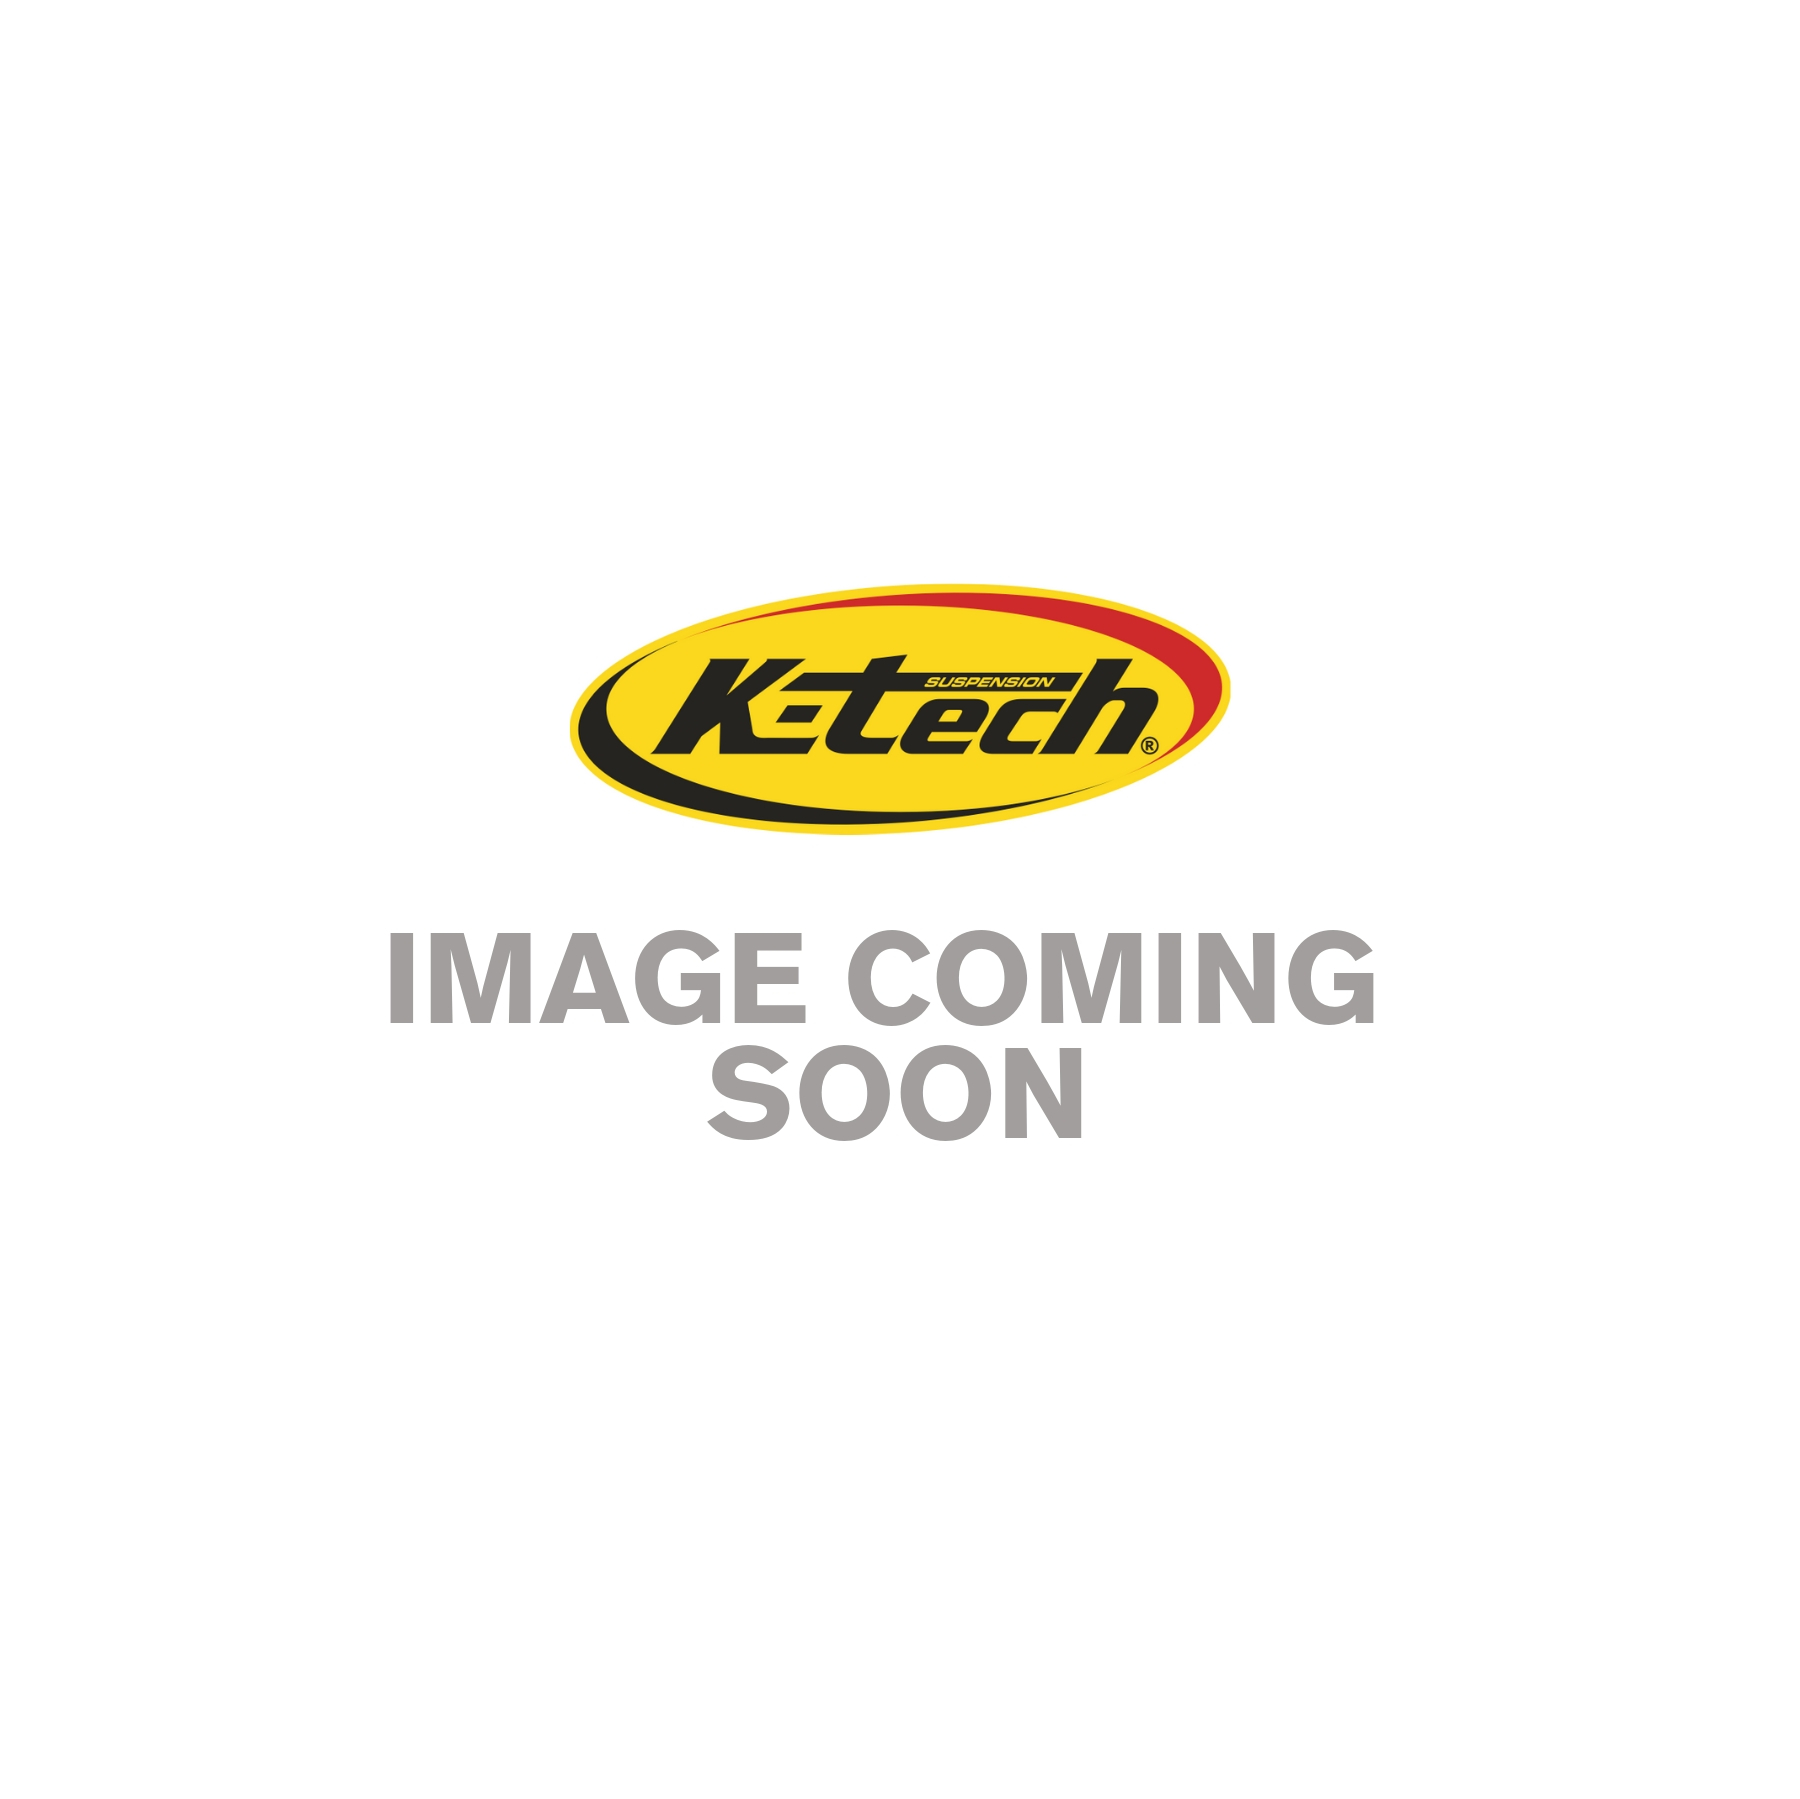 20IDS / Tracker Front Fork Dealer Tool Kit